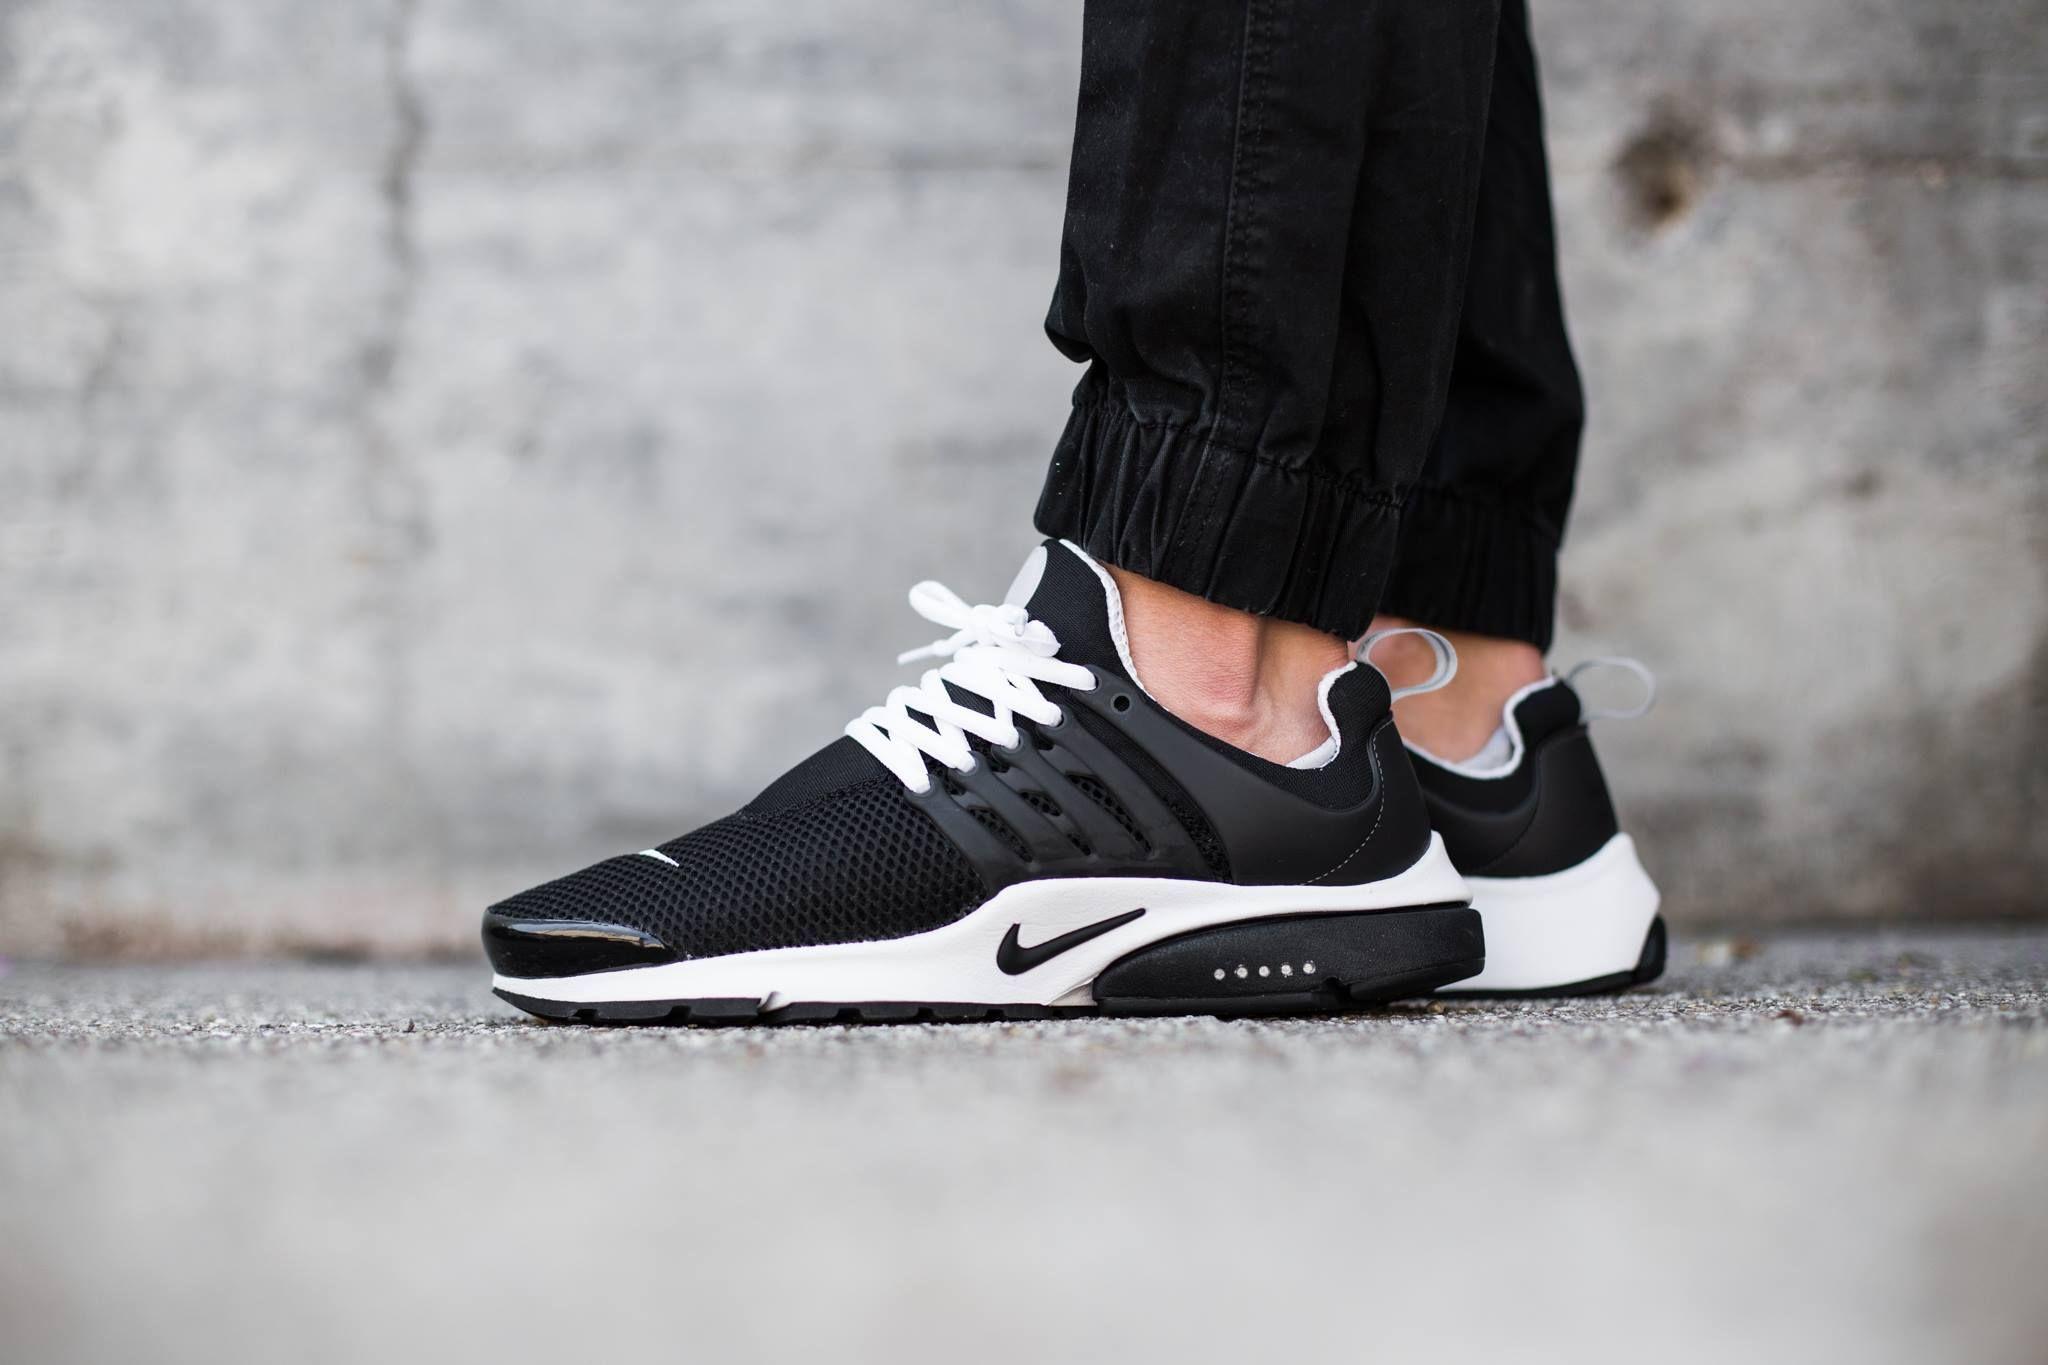 Nike Air Presto White Black